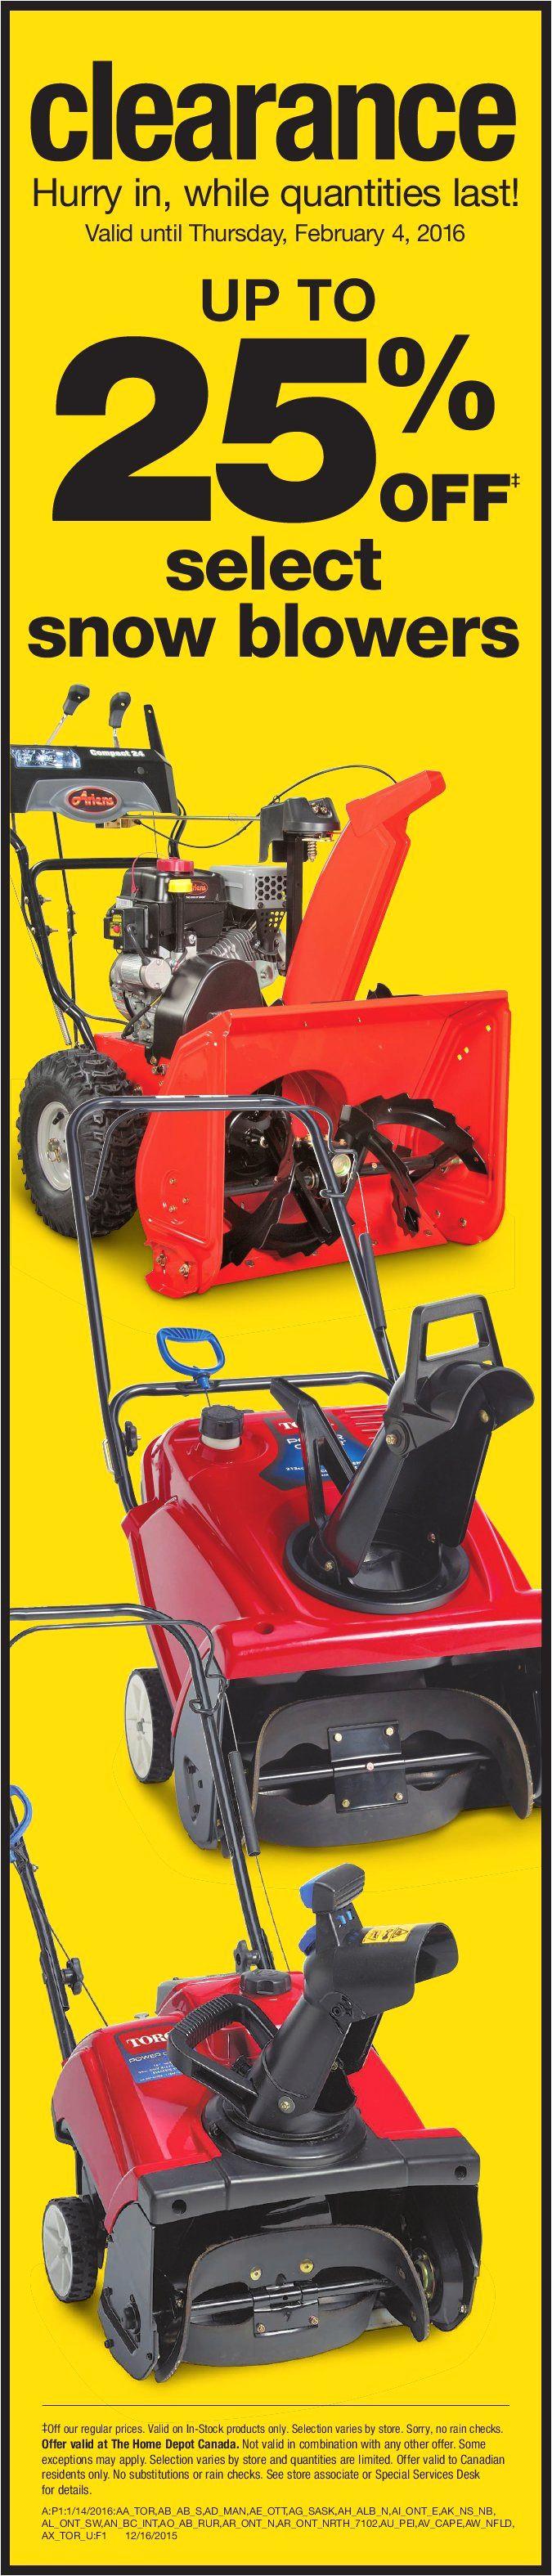 paint shaver pro rental home depot beautiful home depot folding lawn mower